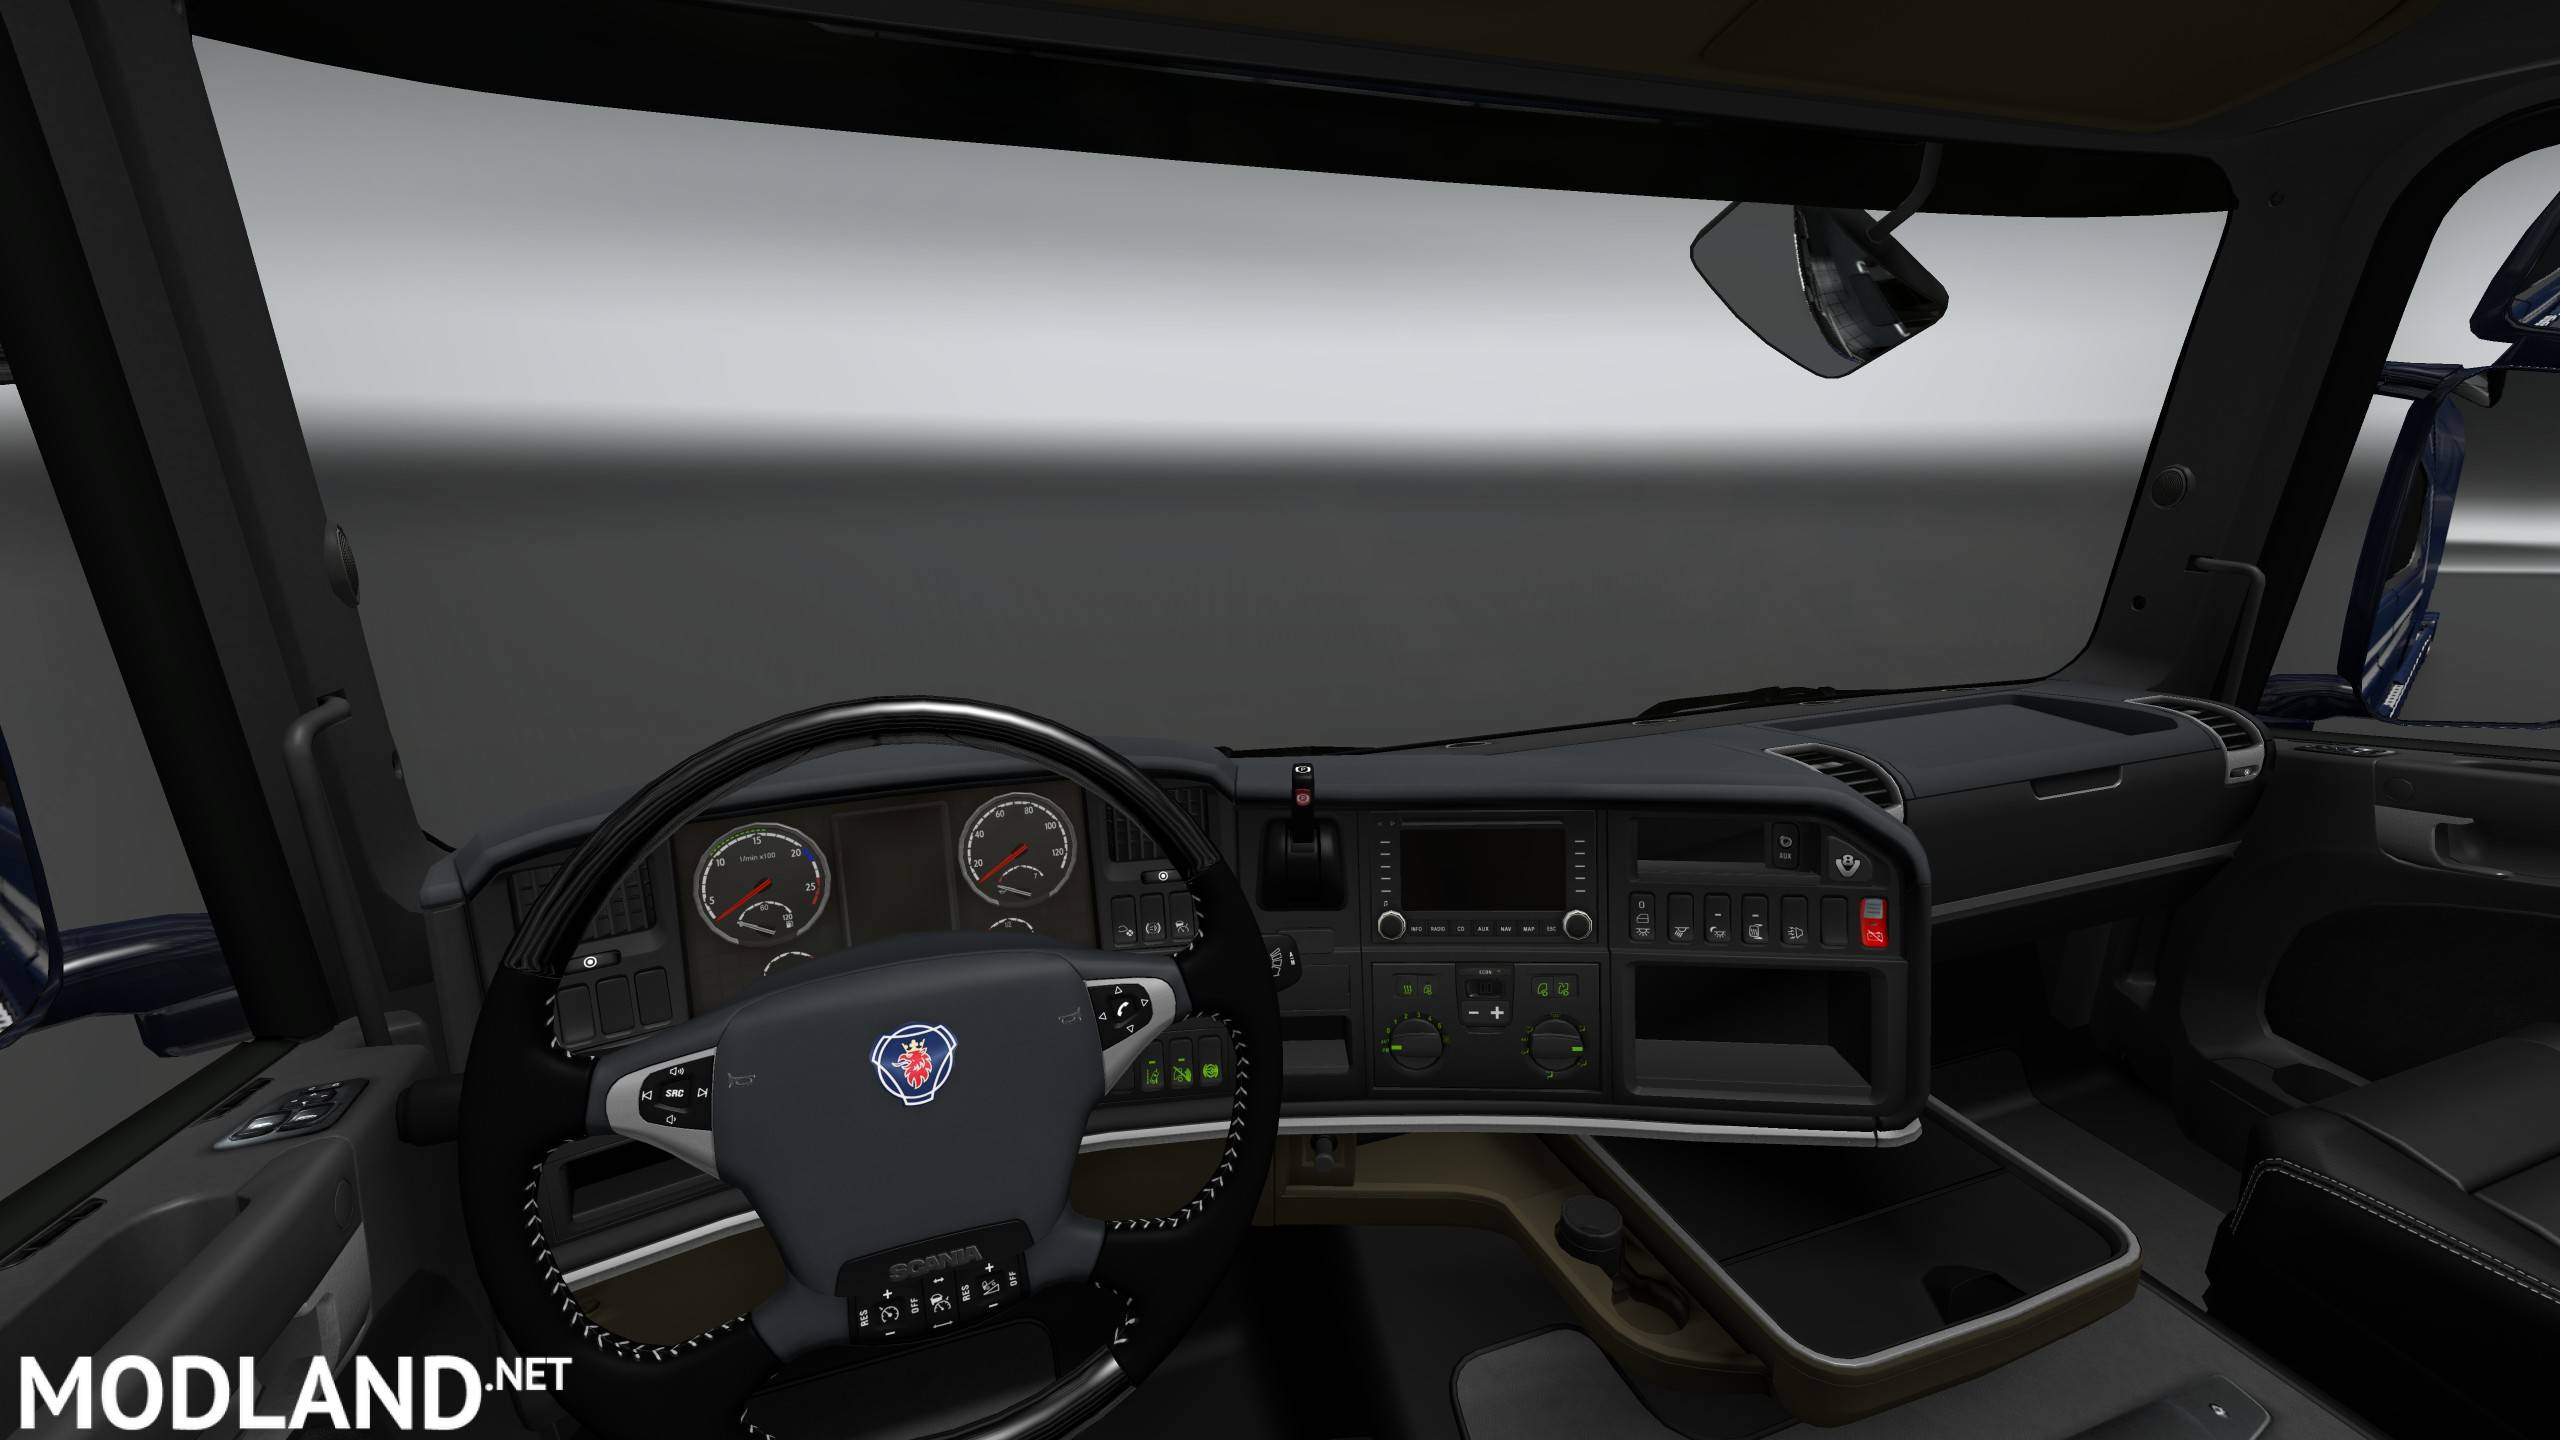 scania trucks interiors exteriors improvements pack mod for ets 2